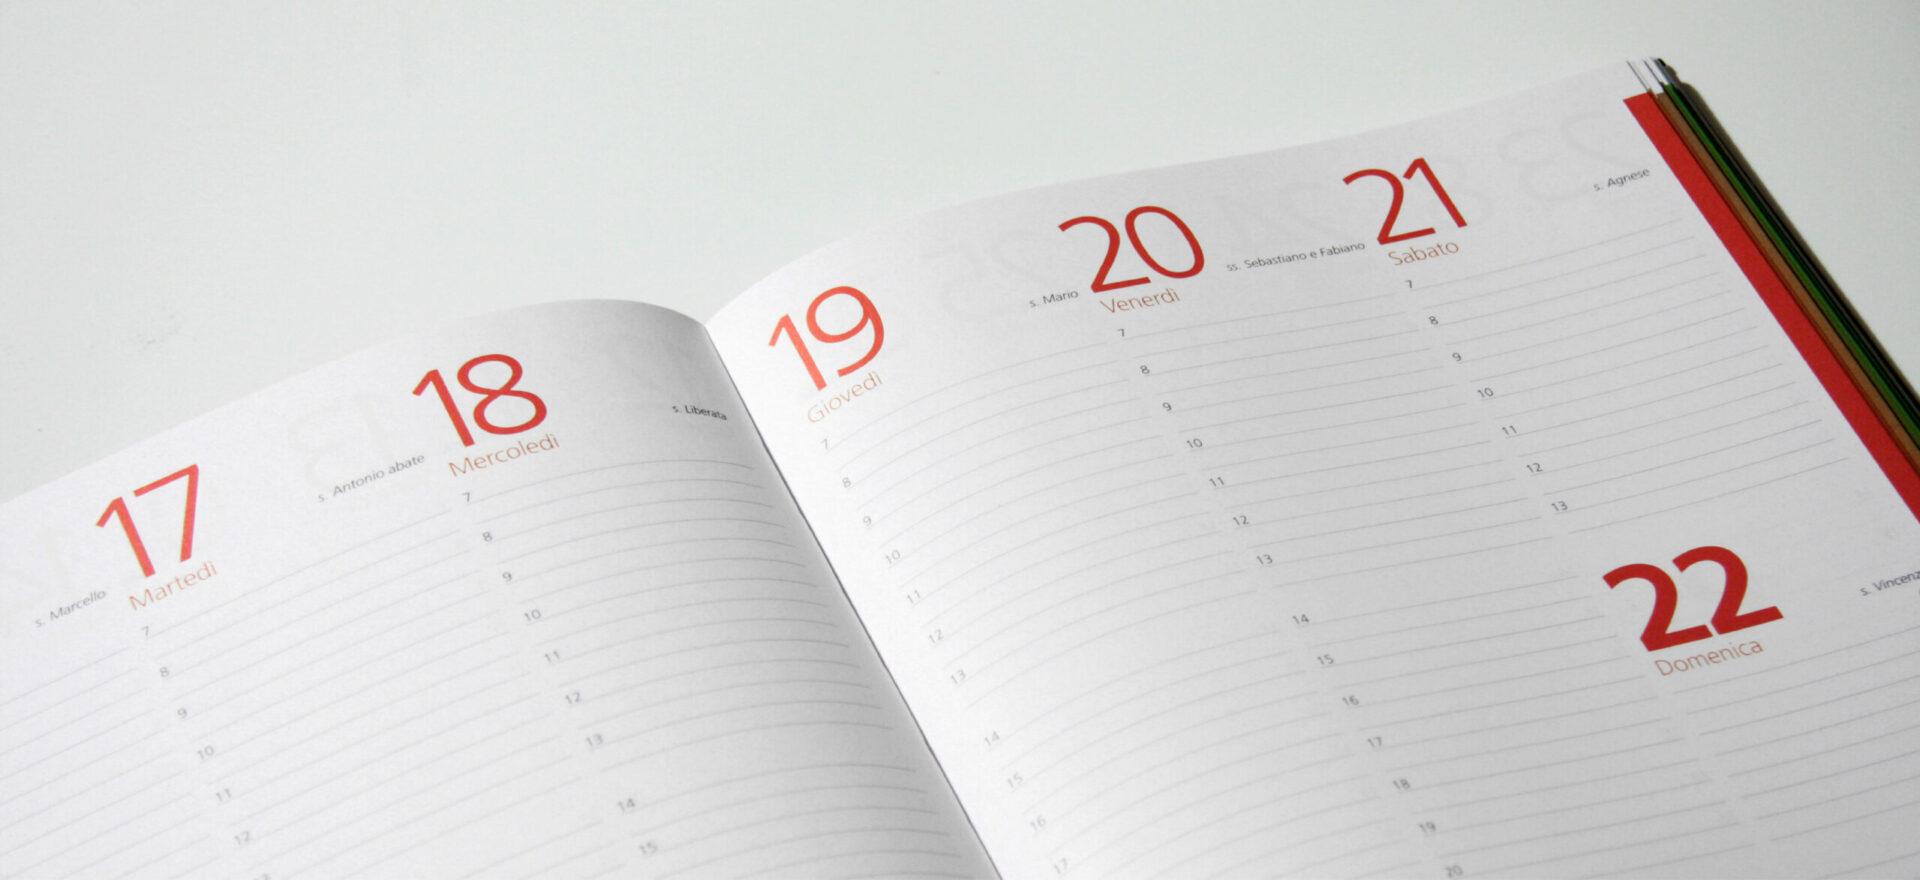 Corporate Catalogue | Communication System | Graphic Design | Banca Intesa | Mario Trimarchi Design | Fragile